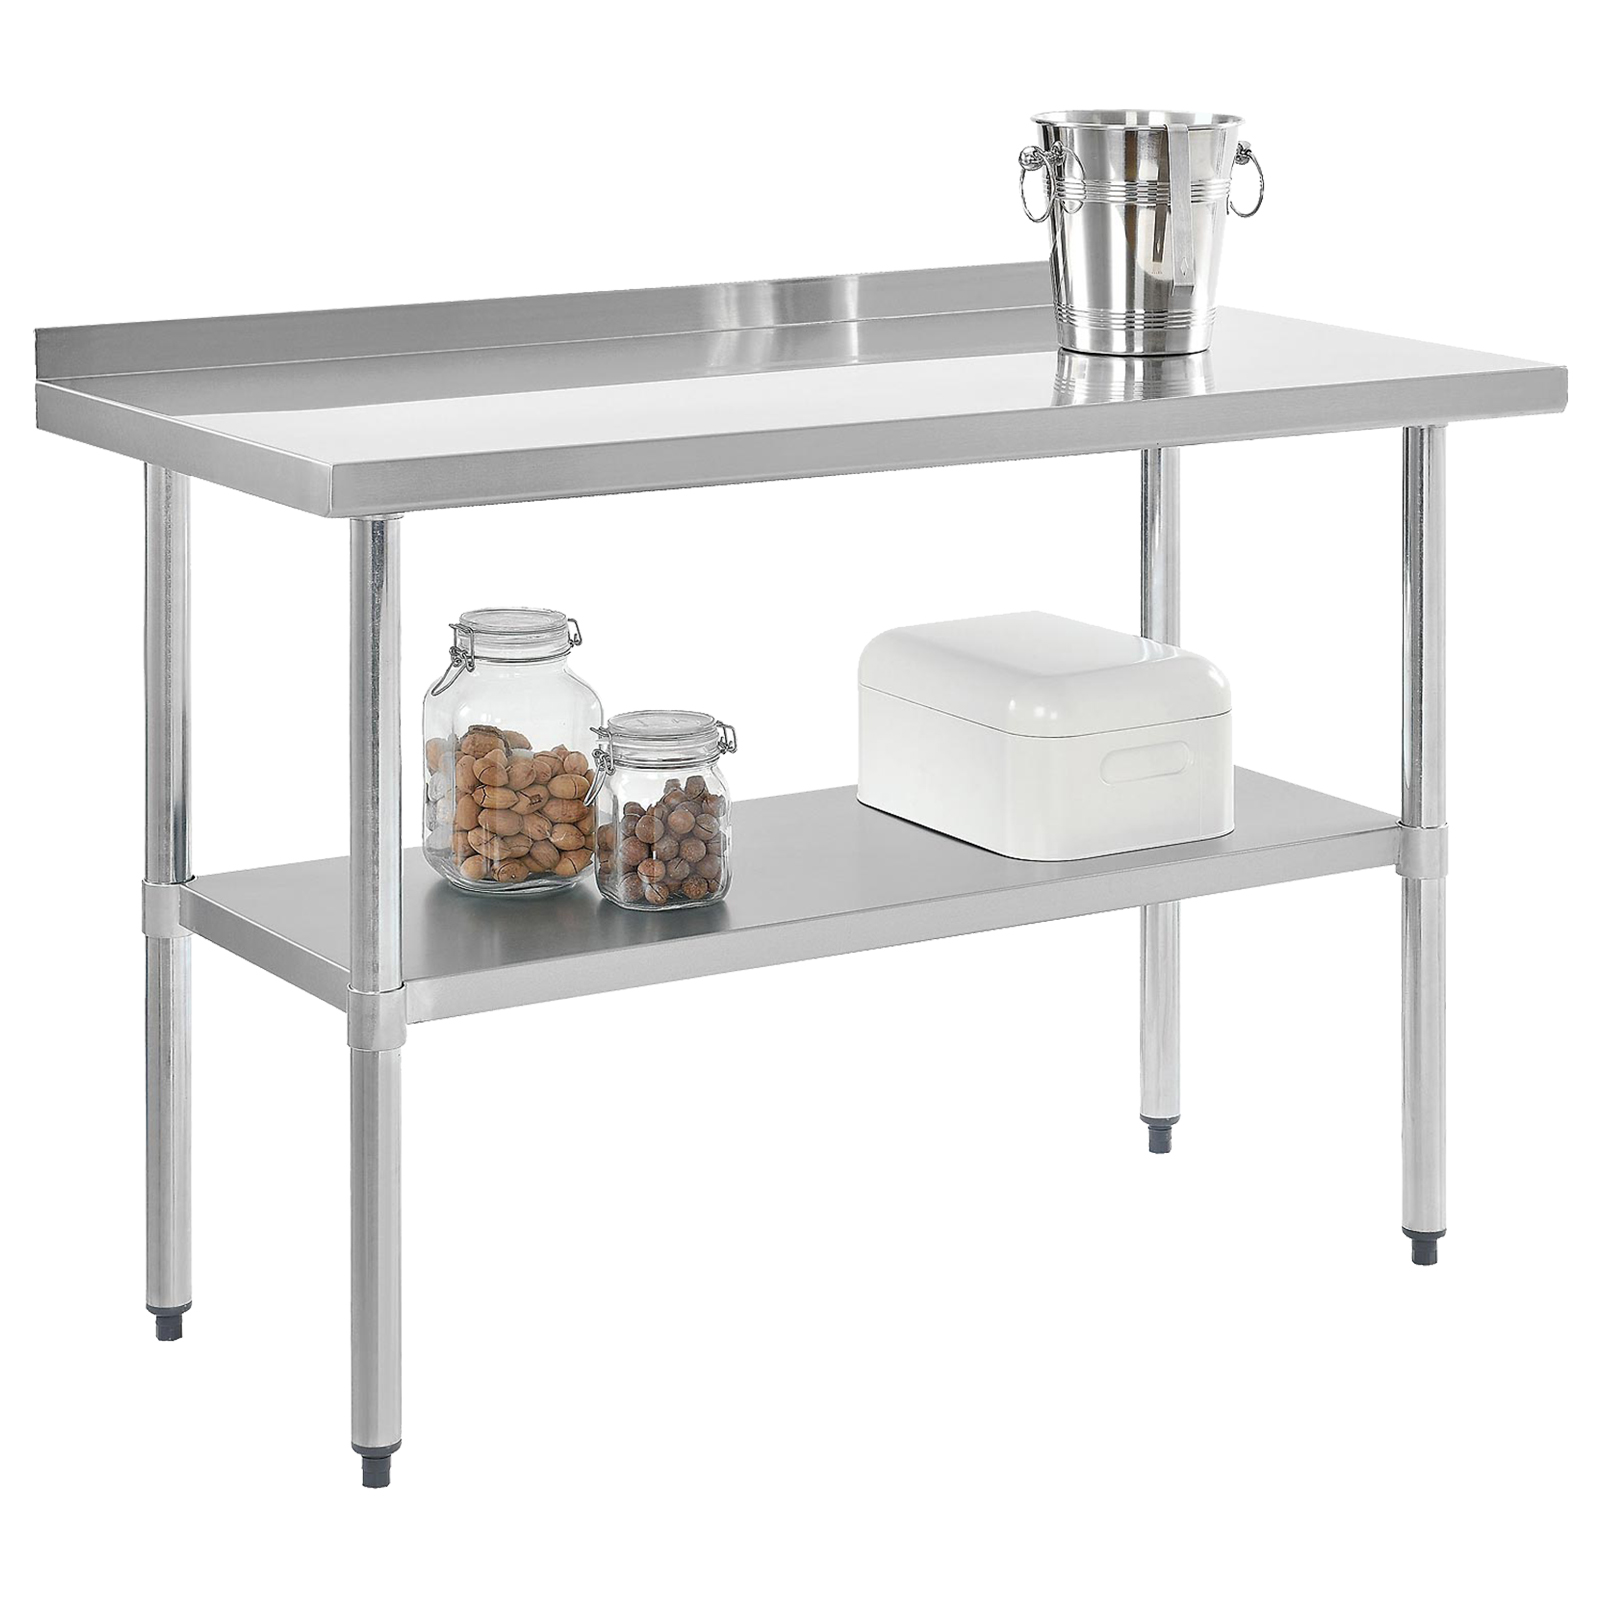 NEXEL WB4824BSS work table,  40